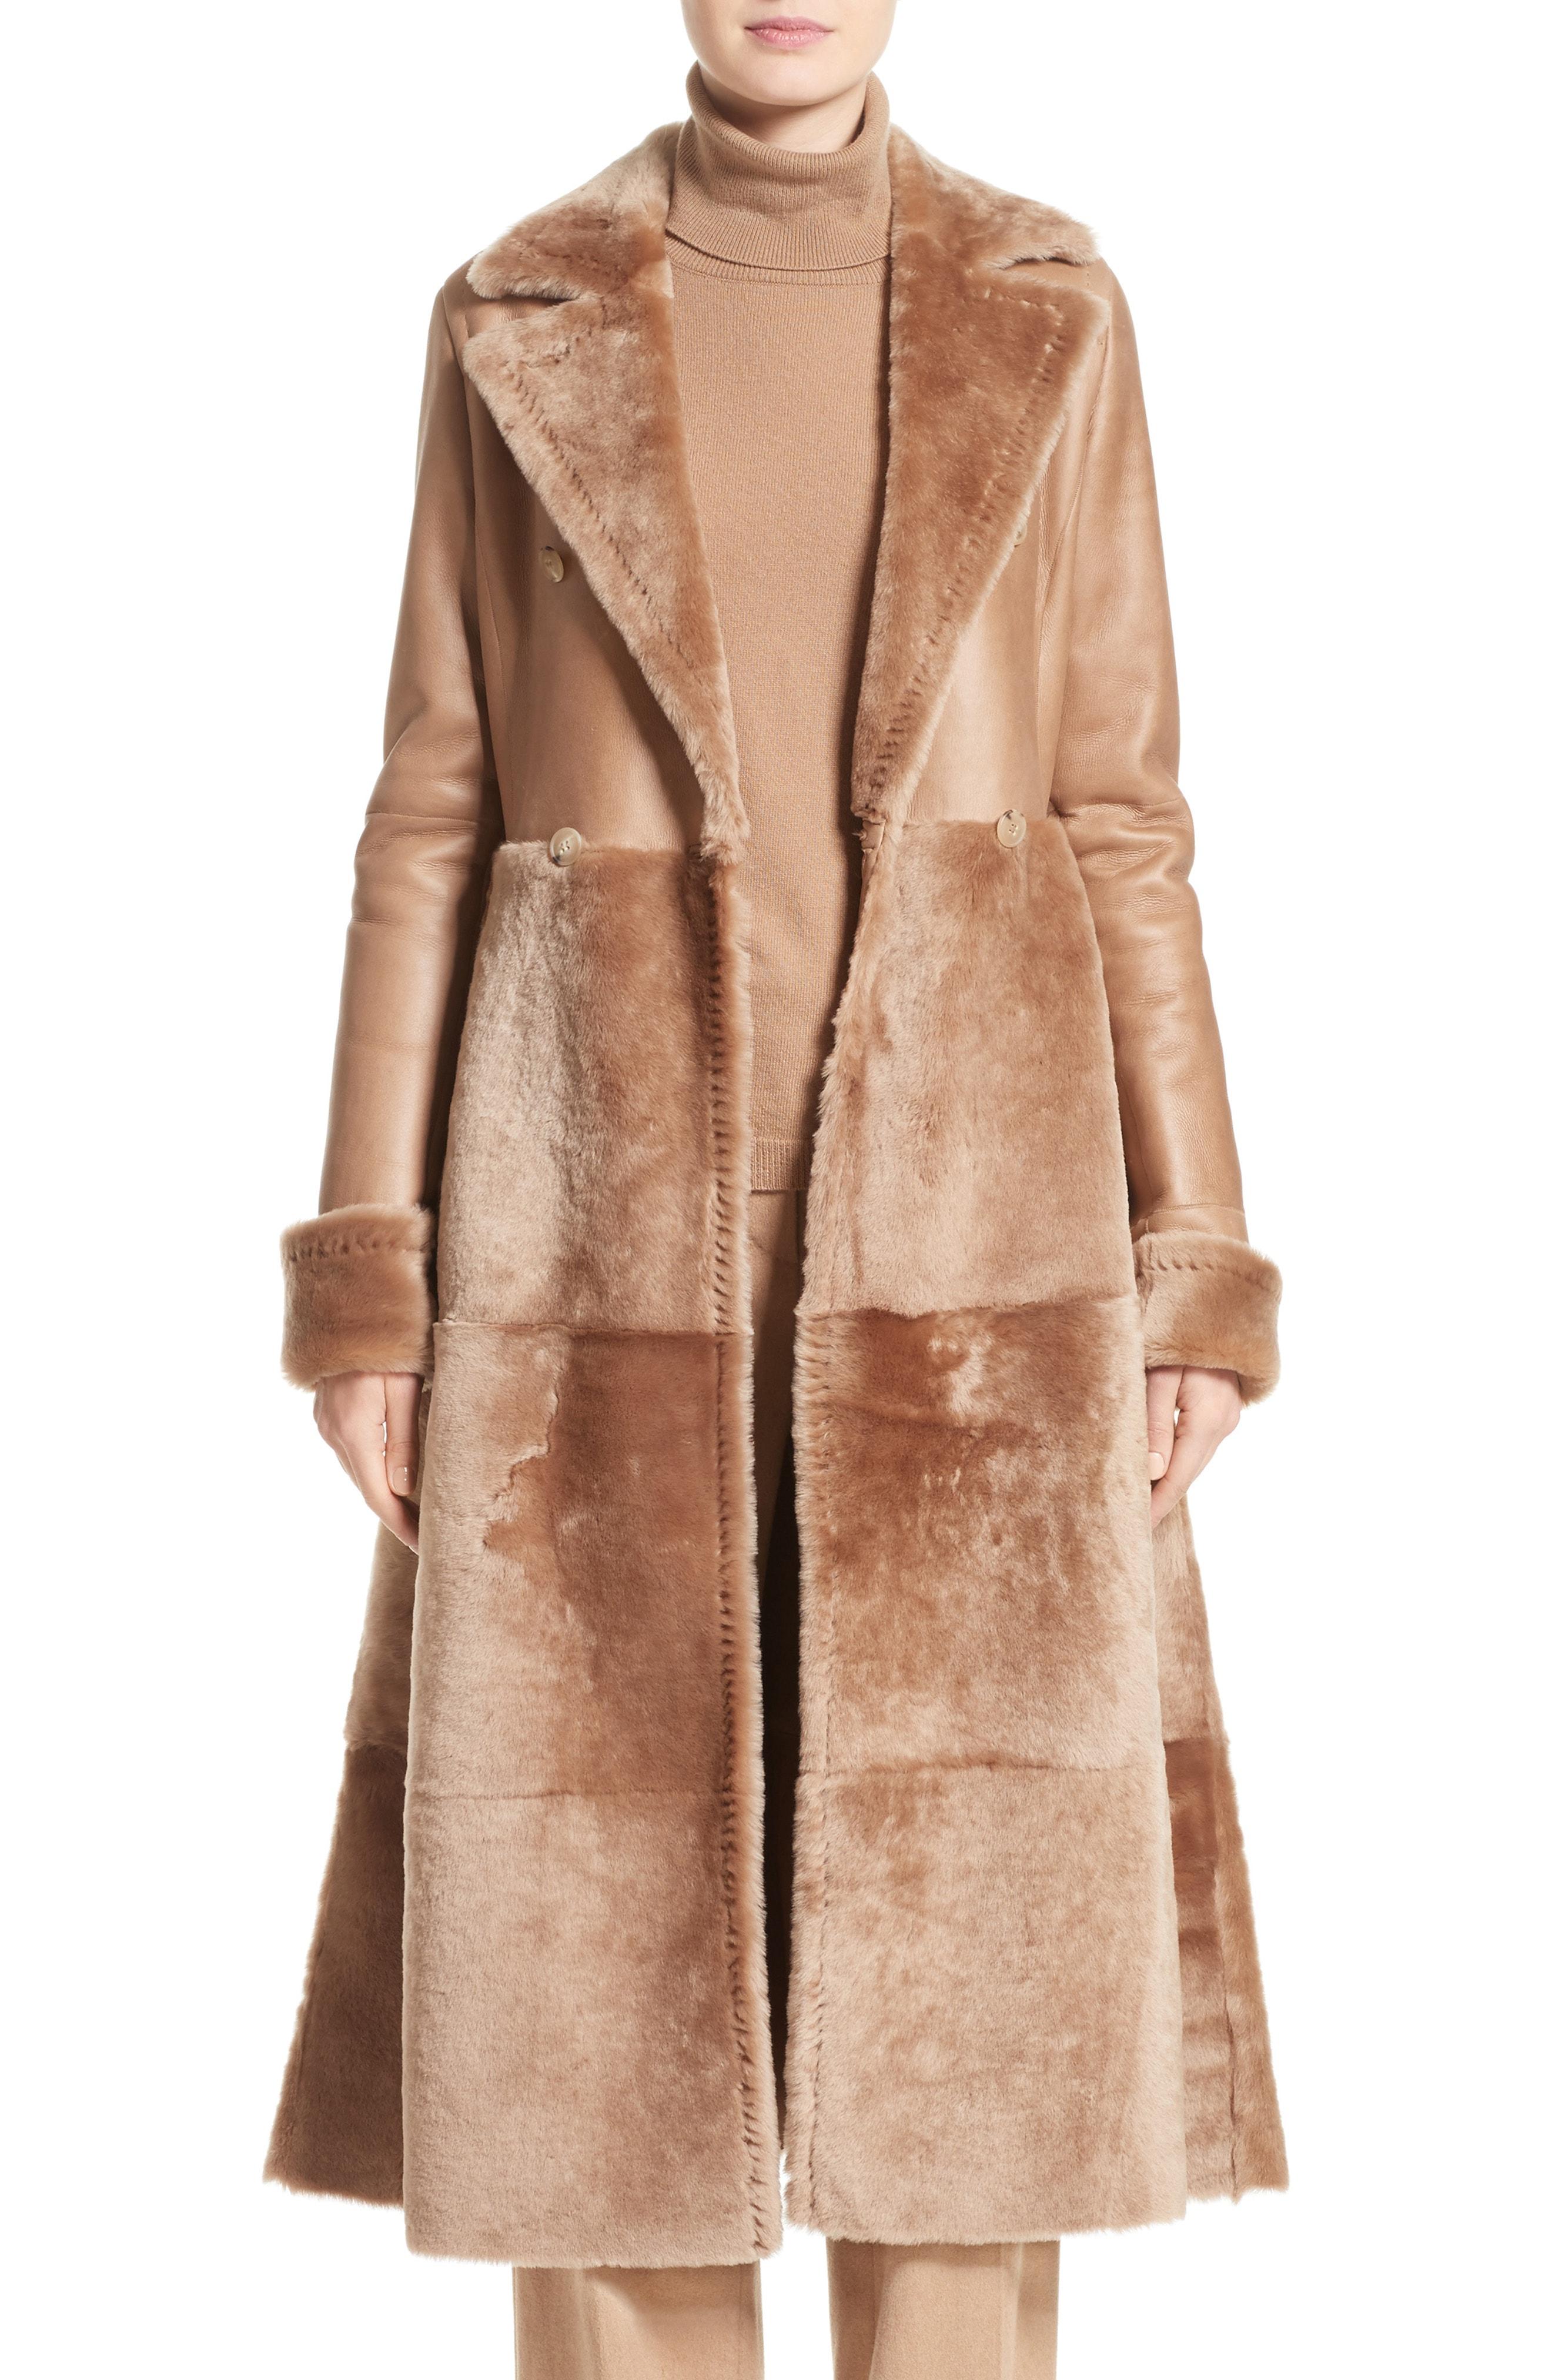 Women's Shearling Coats & Jackets   Nordstrom